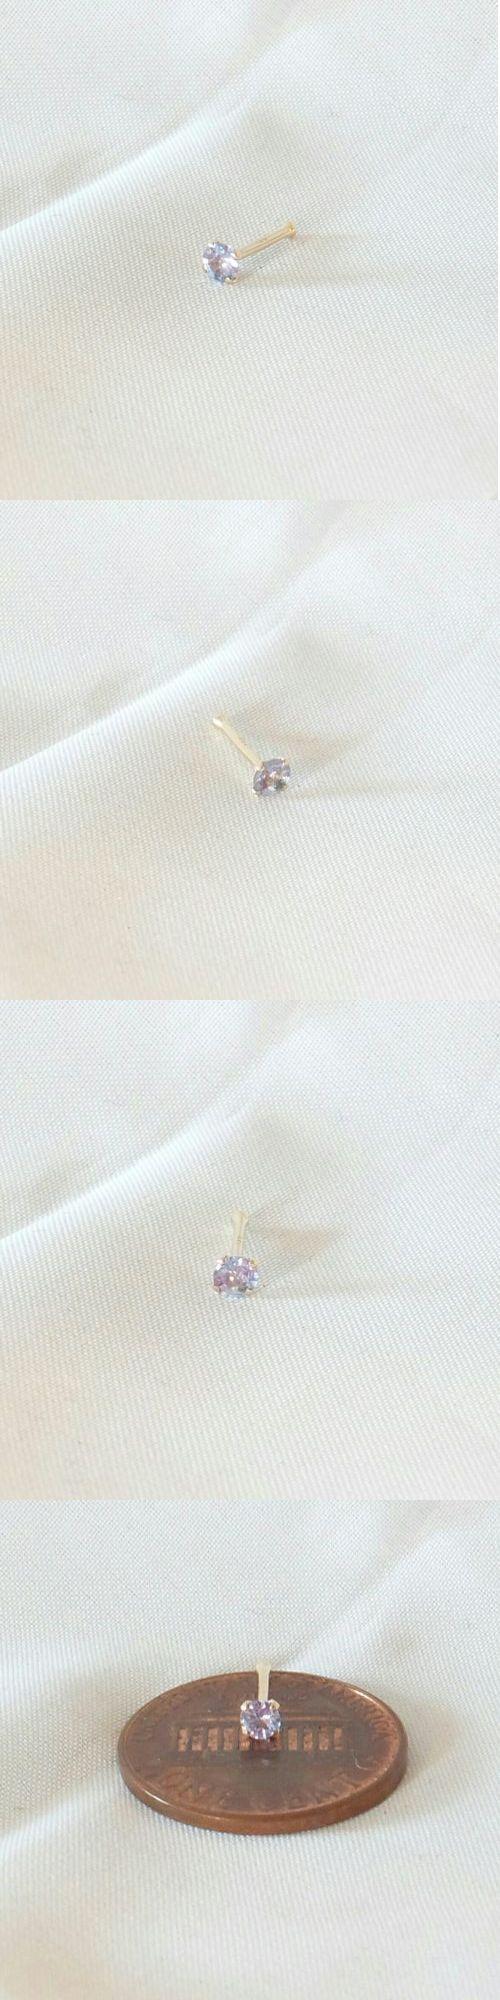 Body Piercing Jewelry 32050: 2.7Mm Genuine Tanzanite 14K Yellow Gold 20G Nose Bone Ring Pin Stud -> BUY IT NOW ONLY: $40 on eBay!